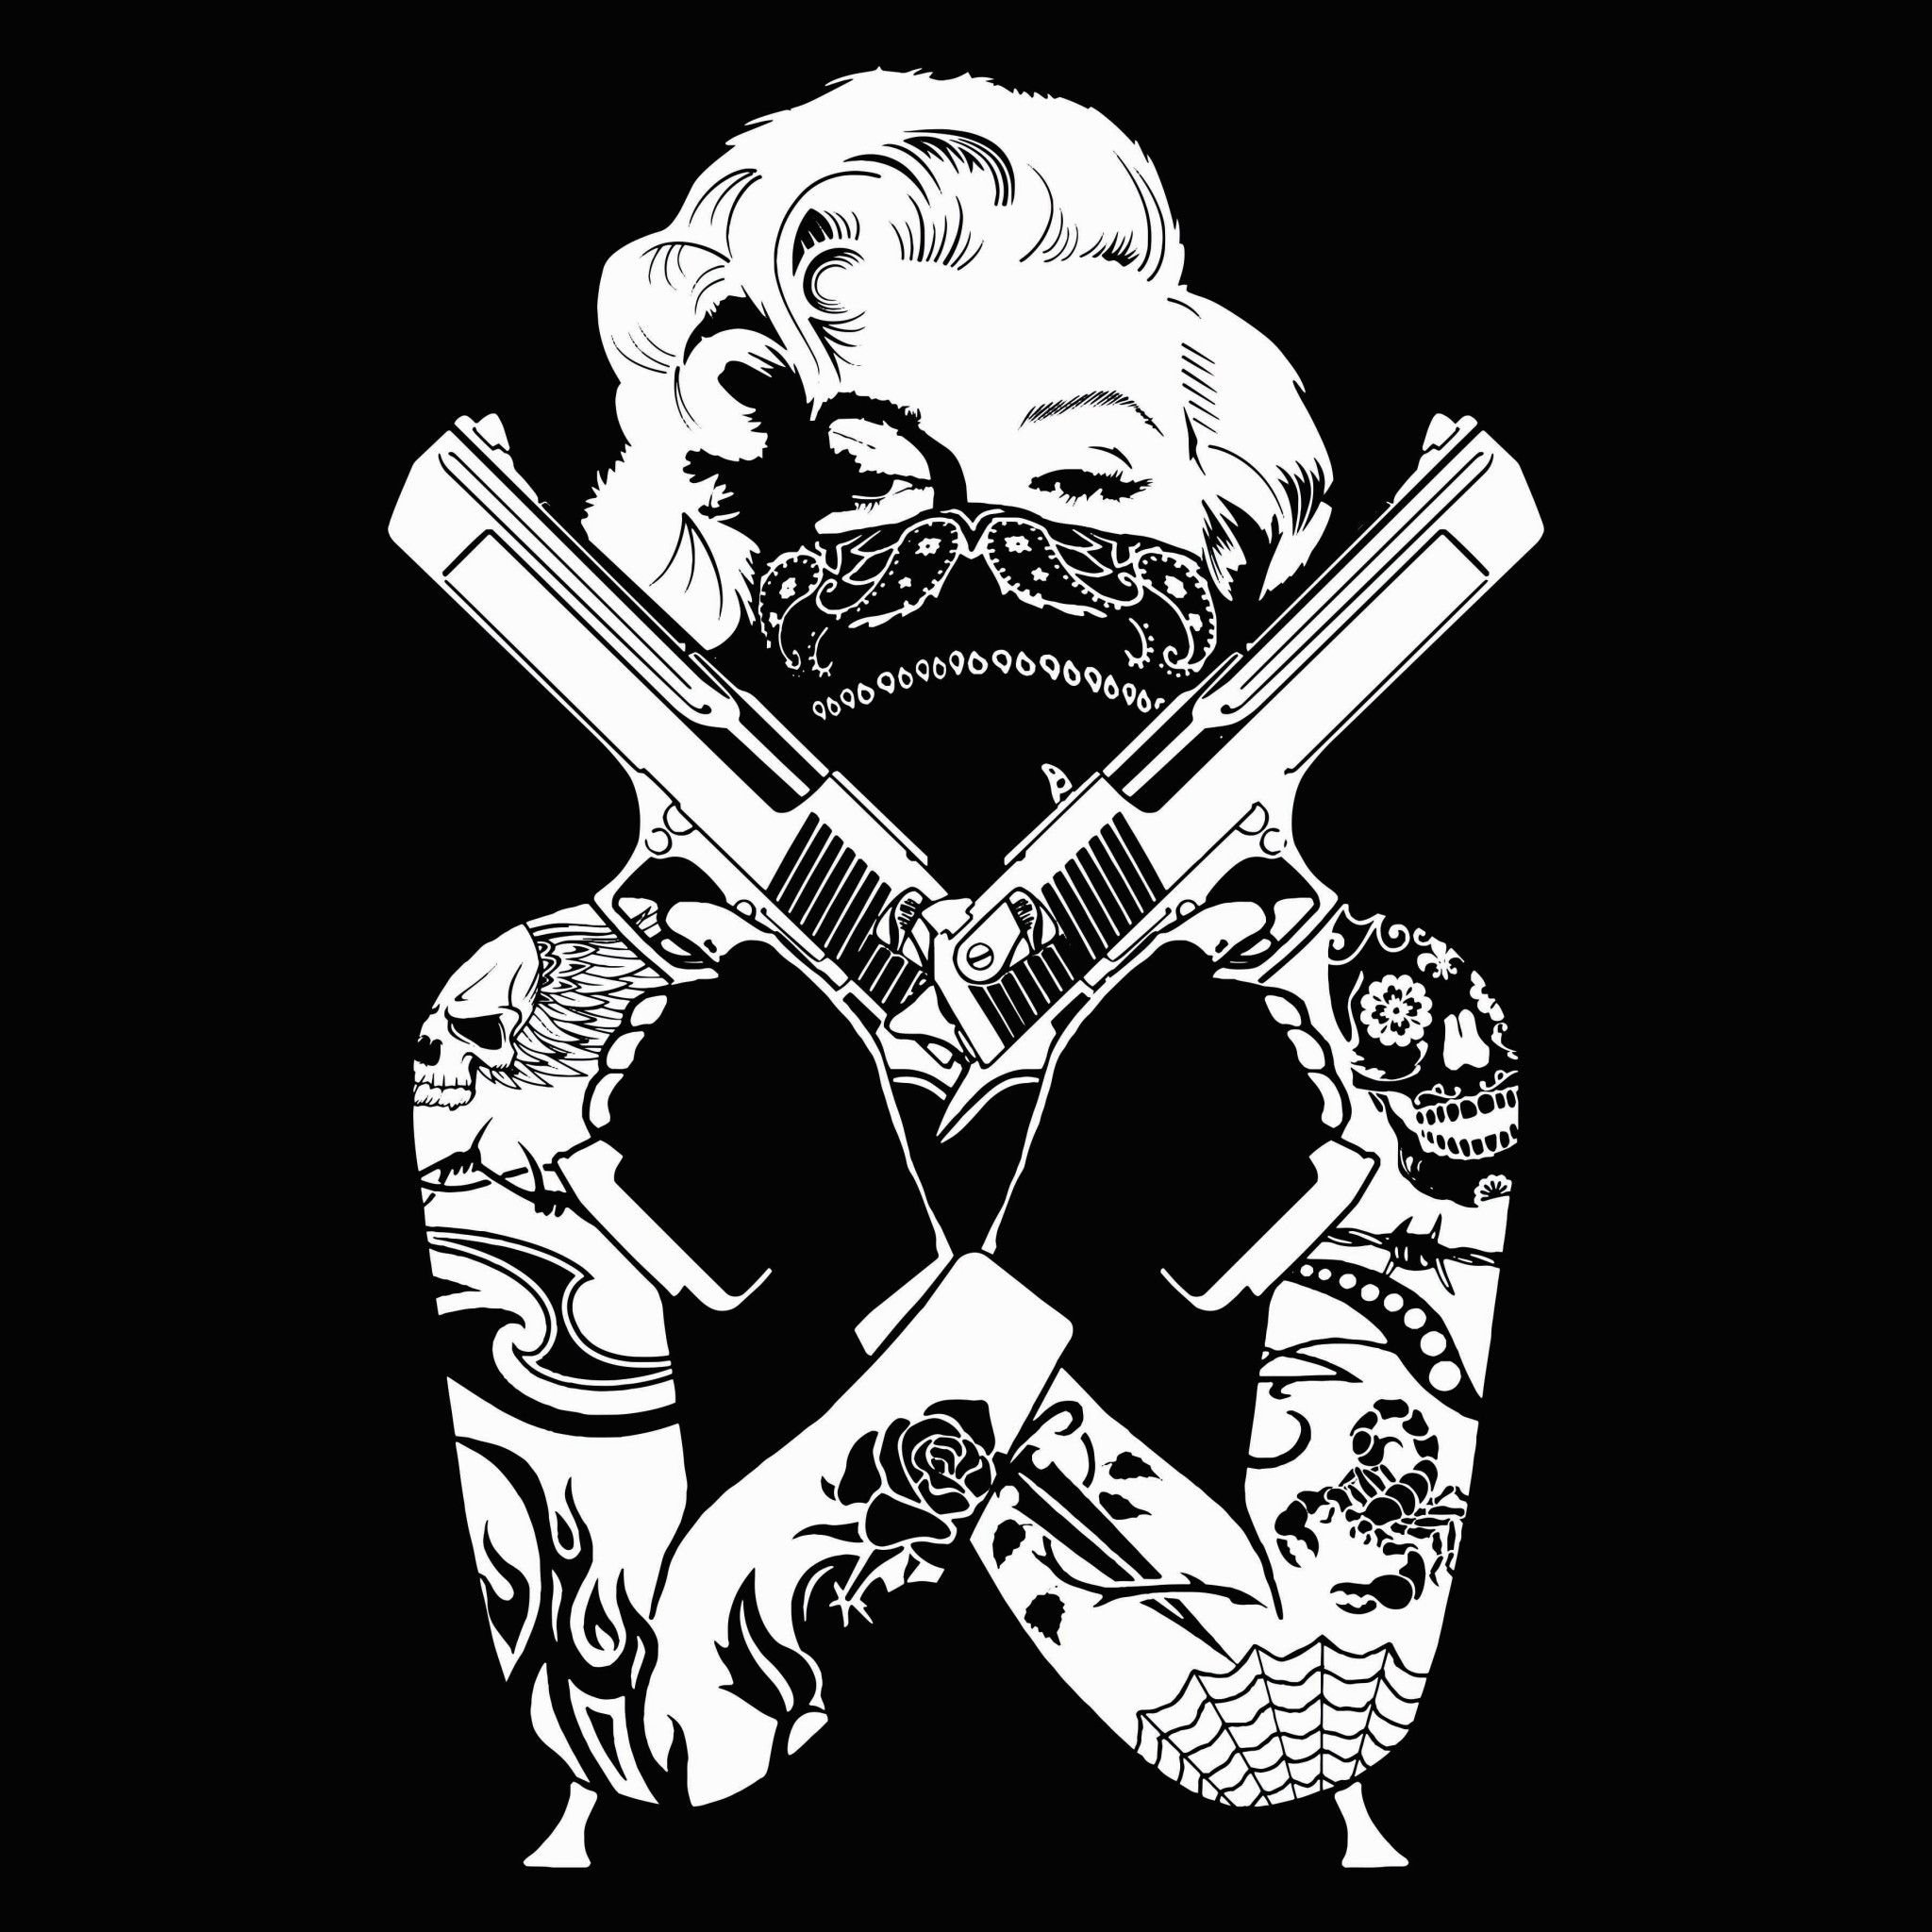 Gangsta Cartoon Wallpapers Top Free Gangsta Cartoon